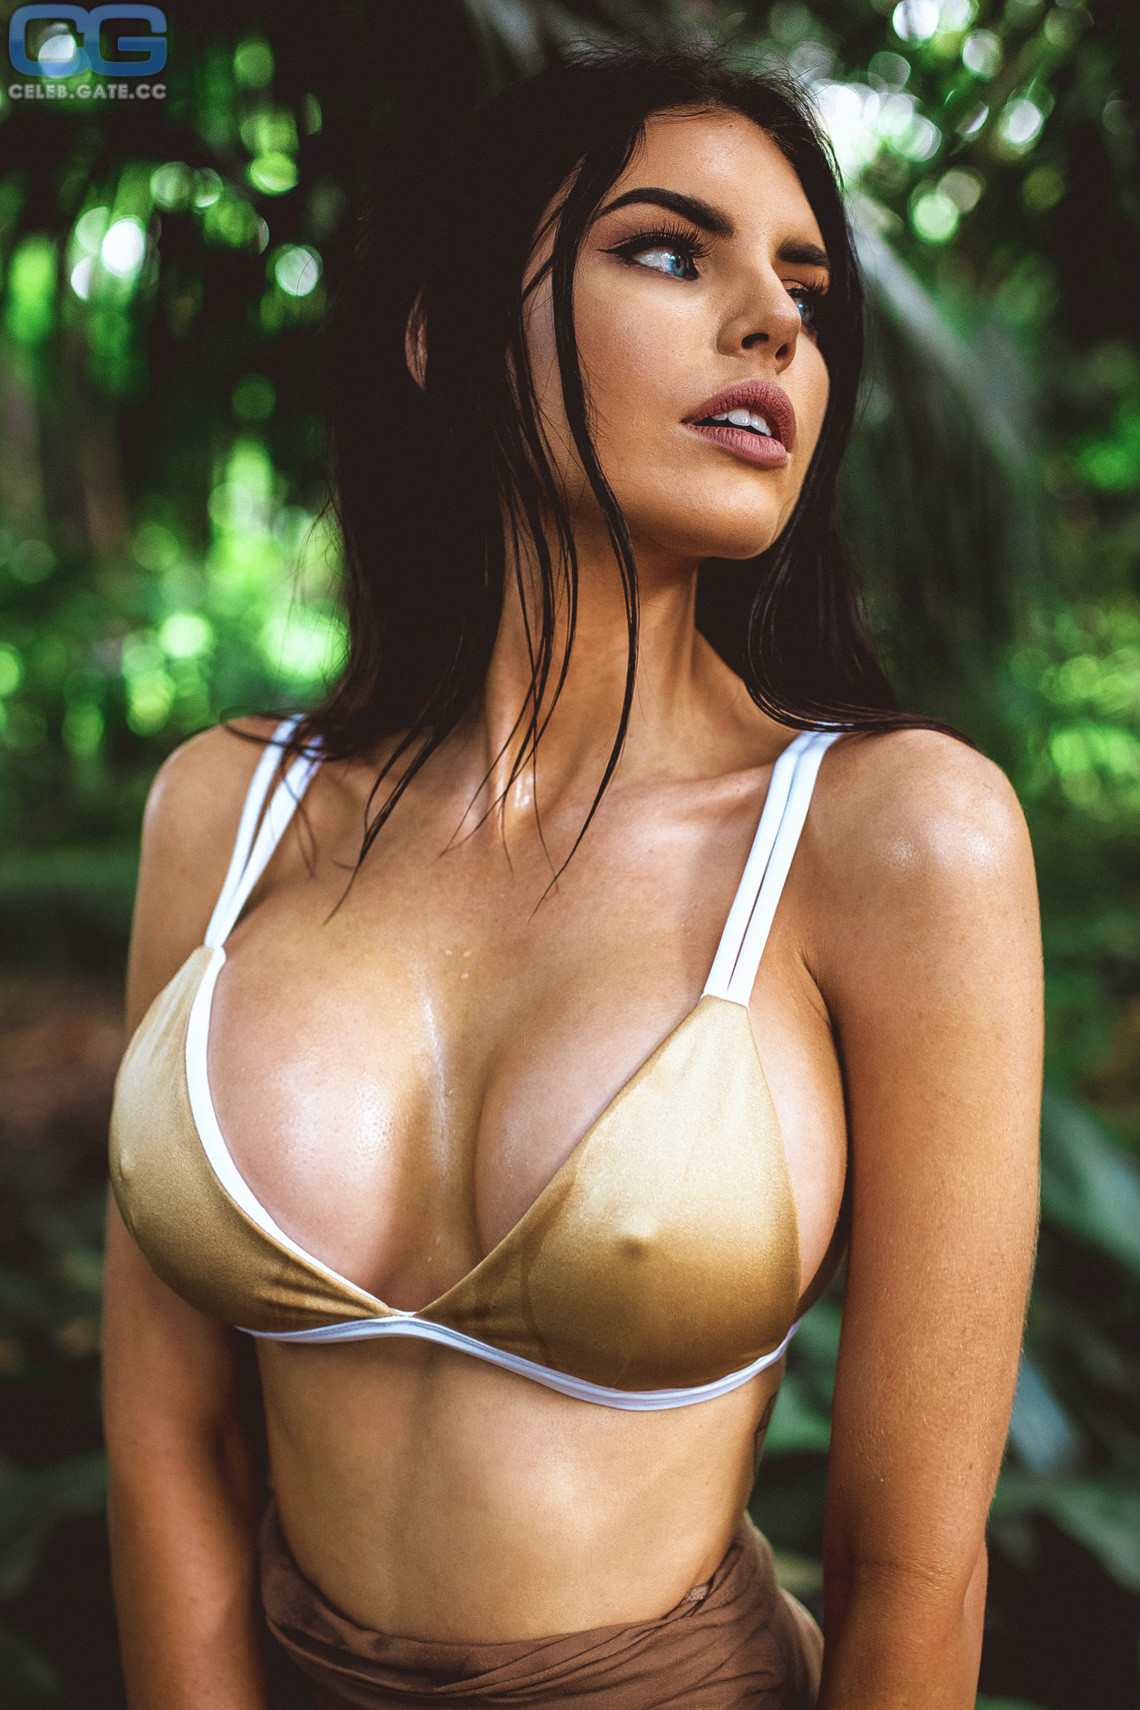 Nicole nackt Thorne Nicole Thorne